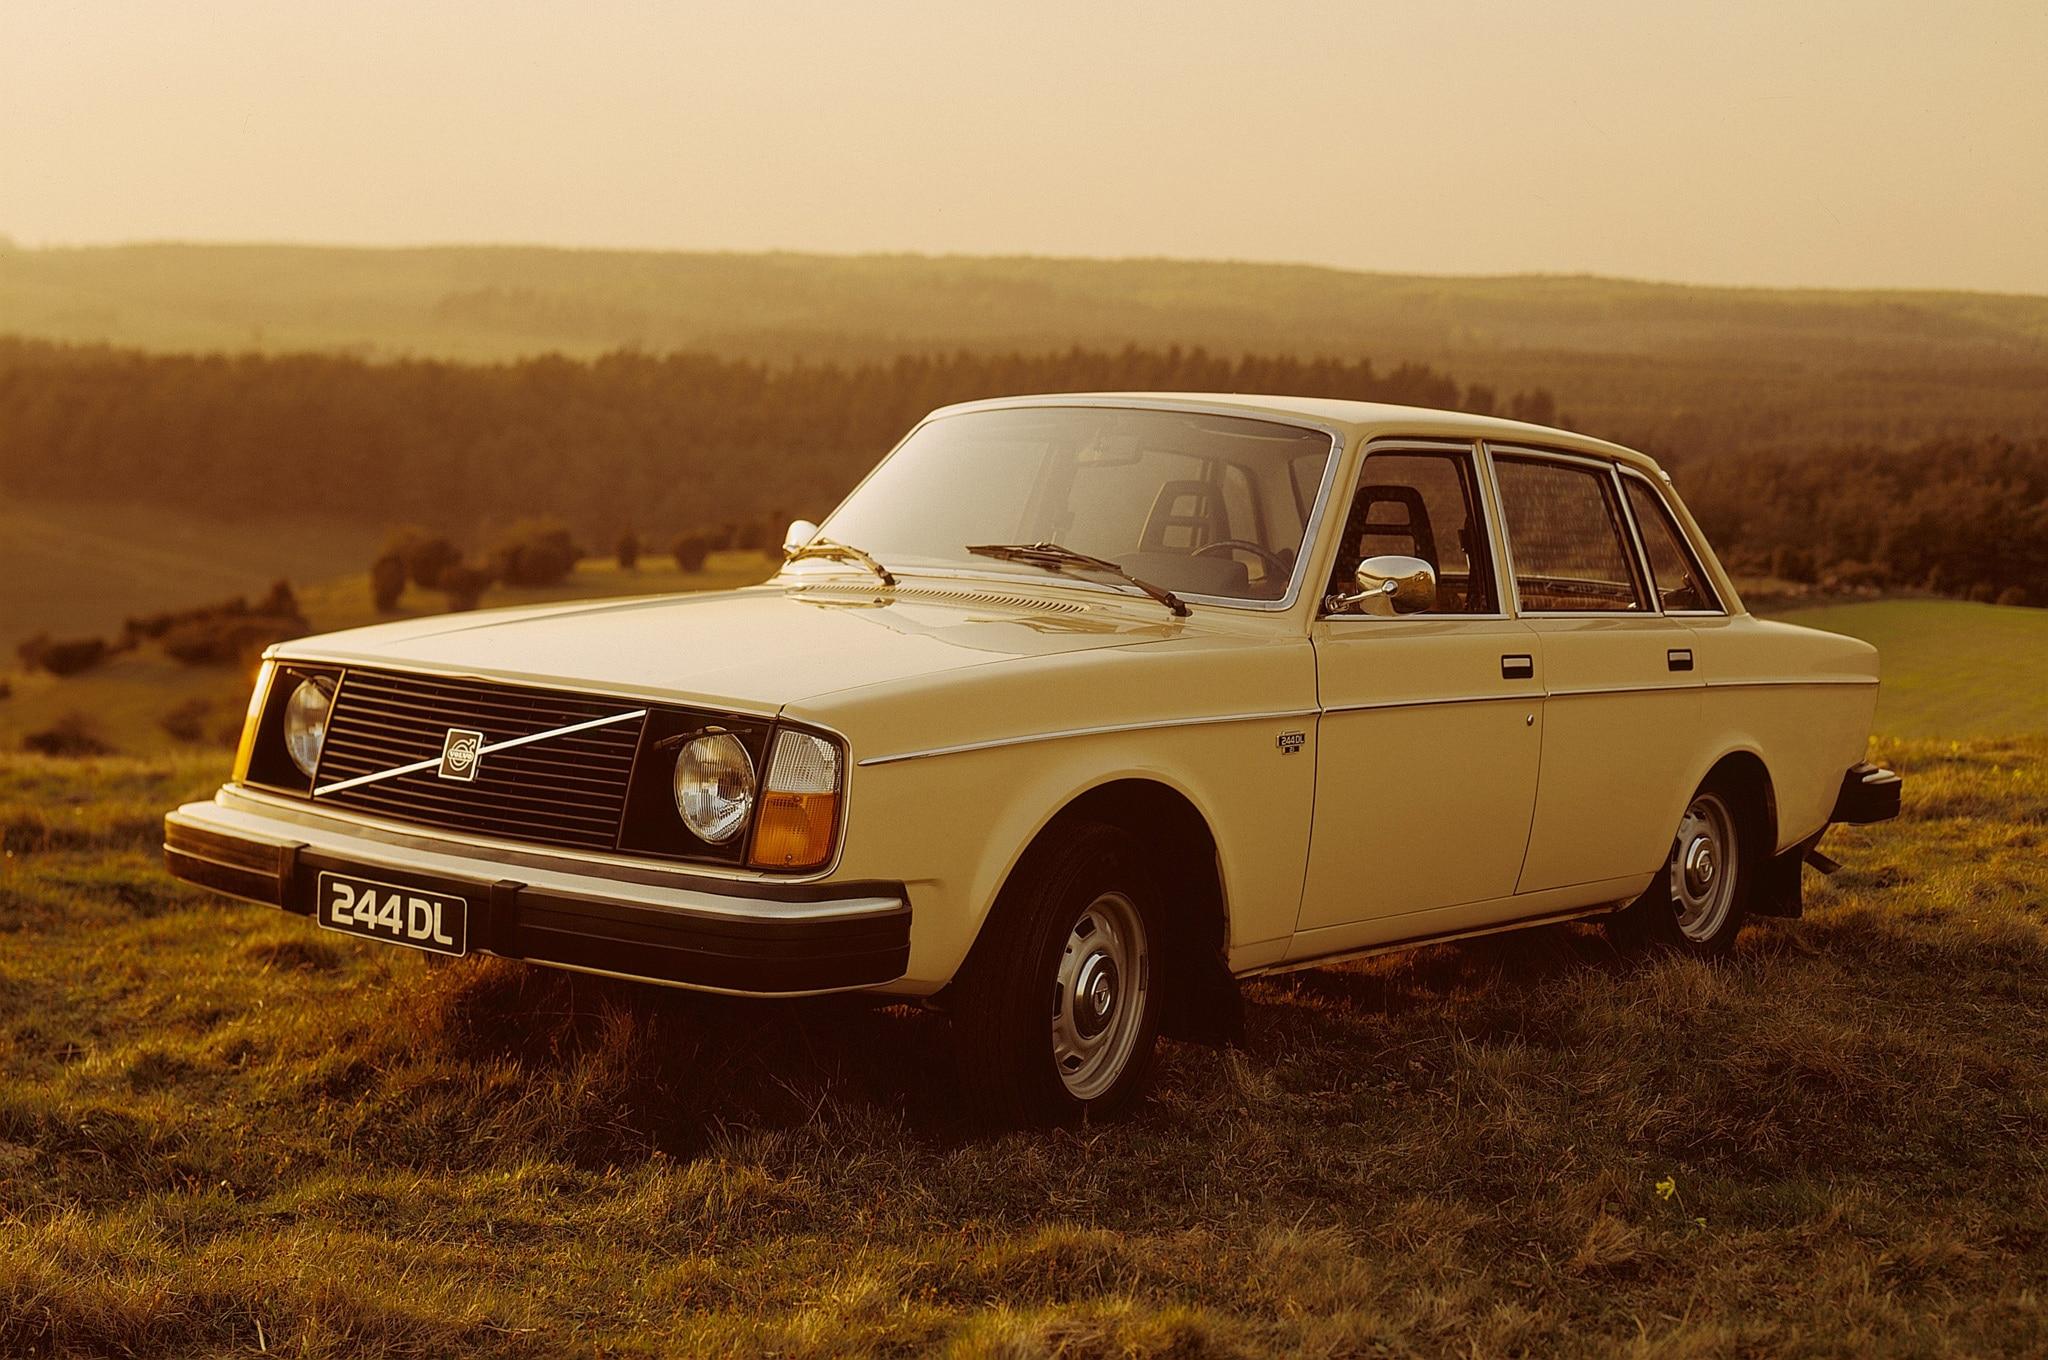 Volvo 244 DL Sedan